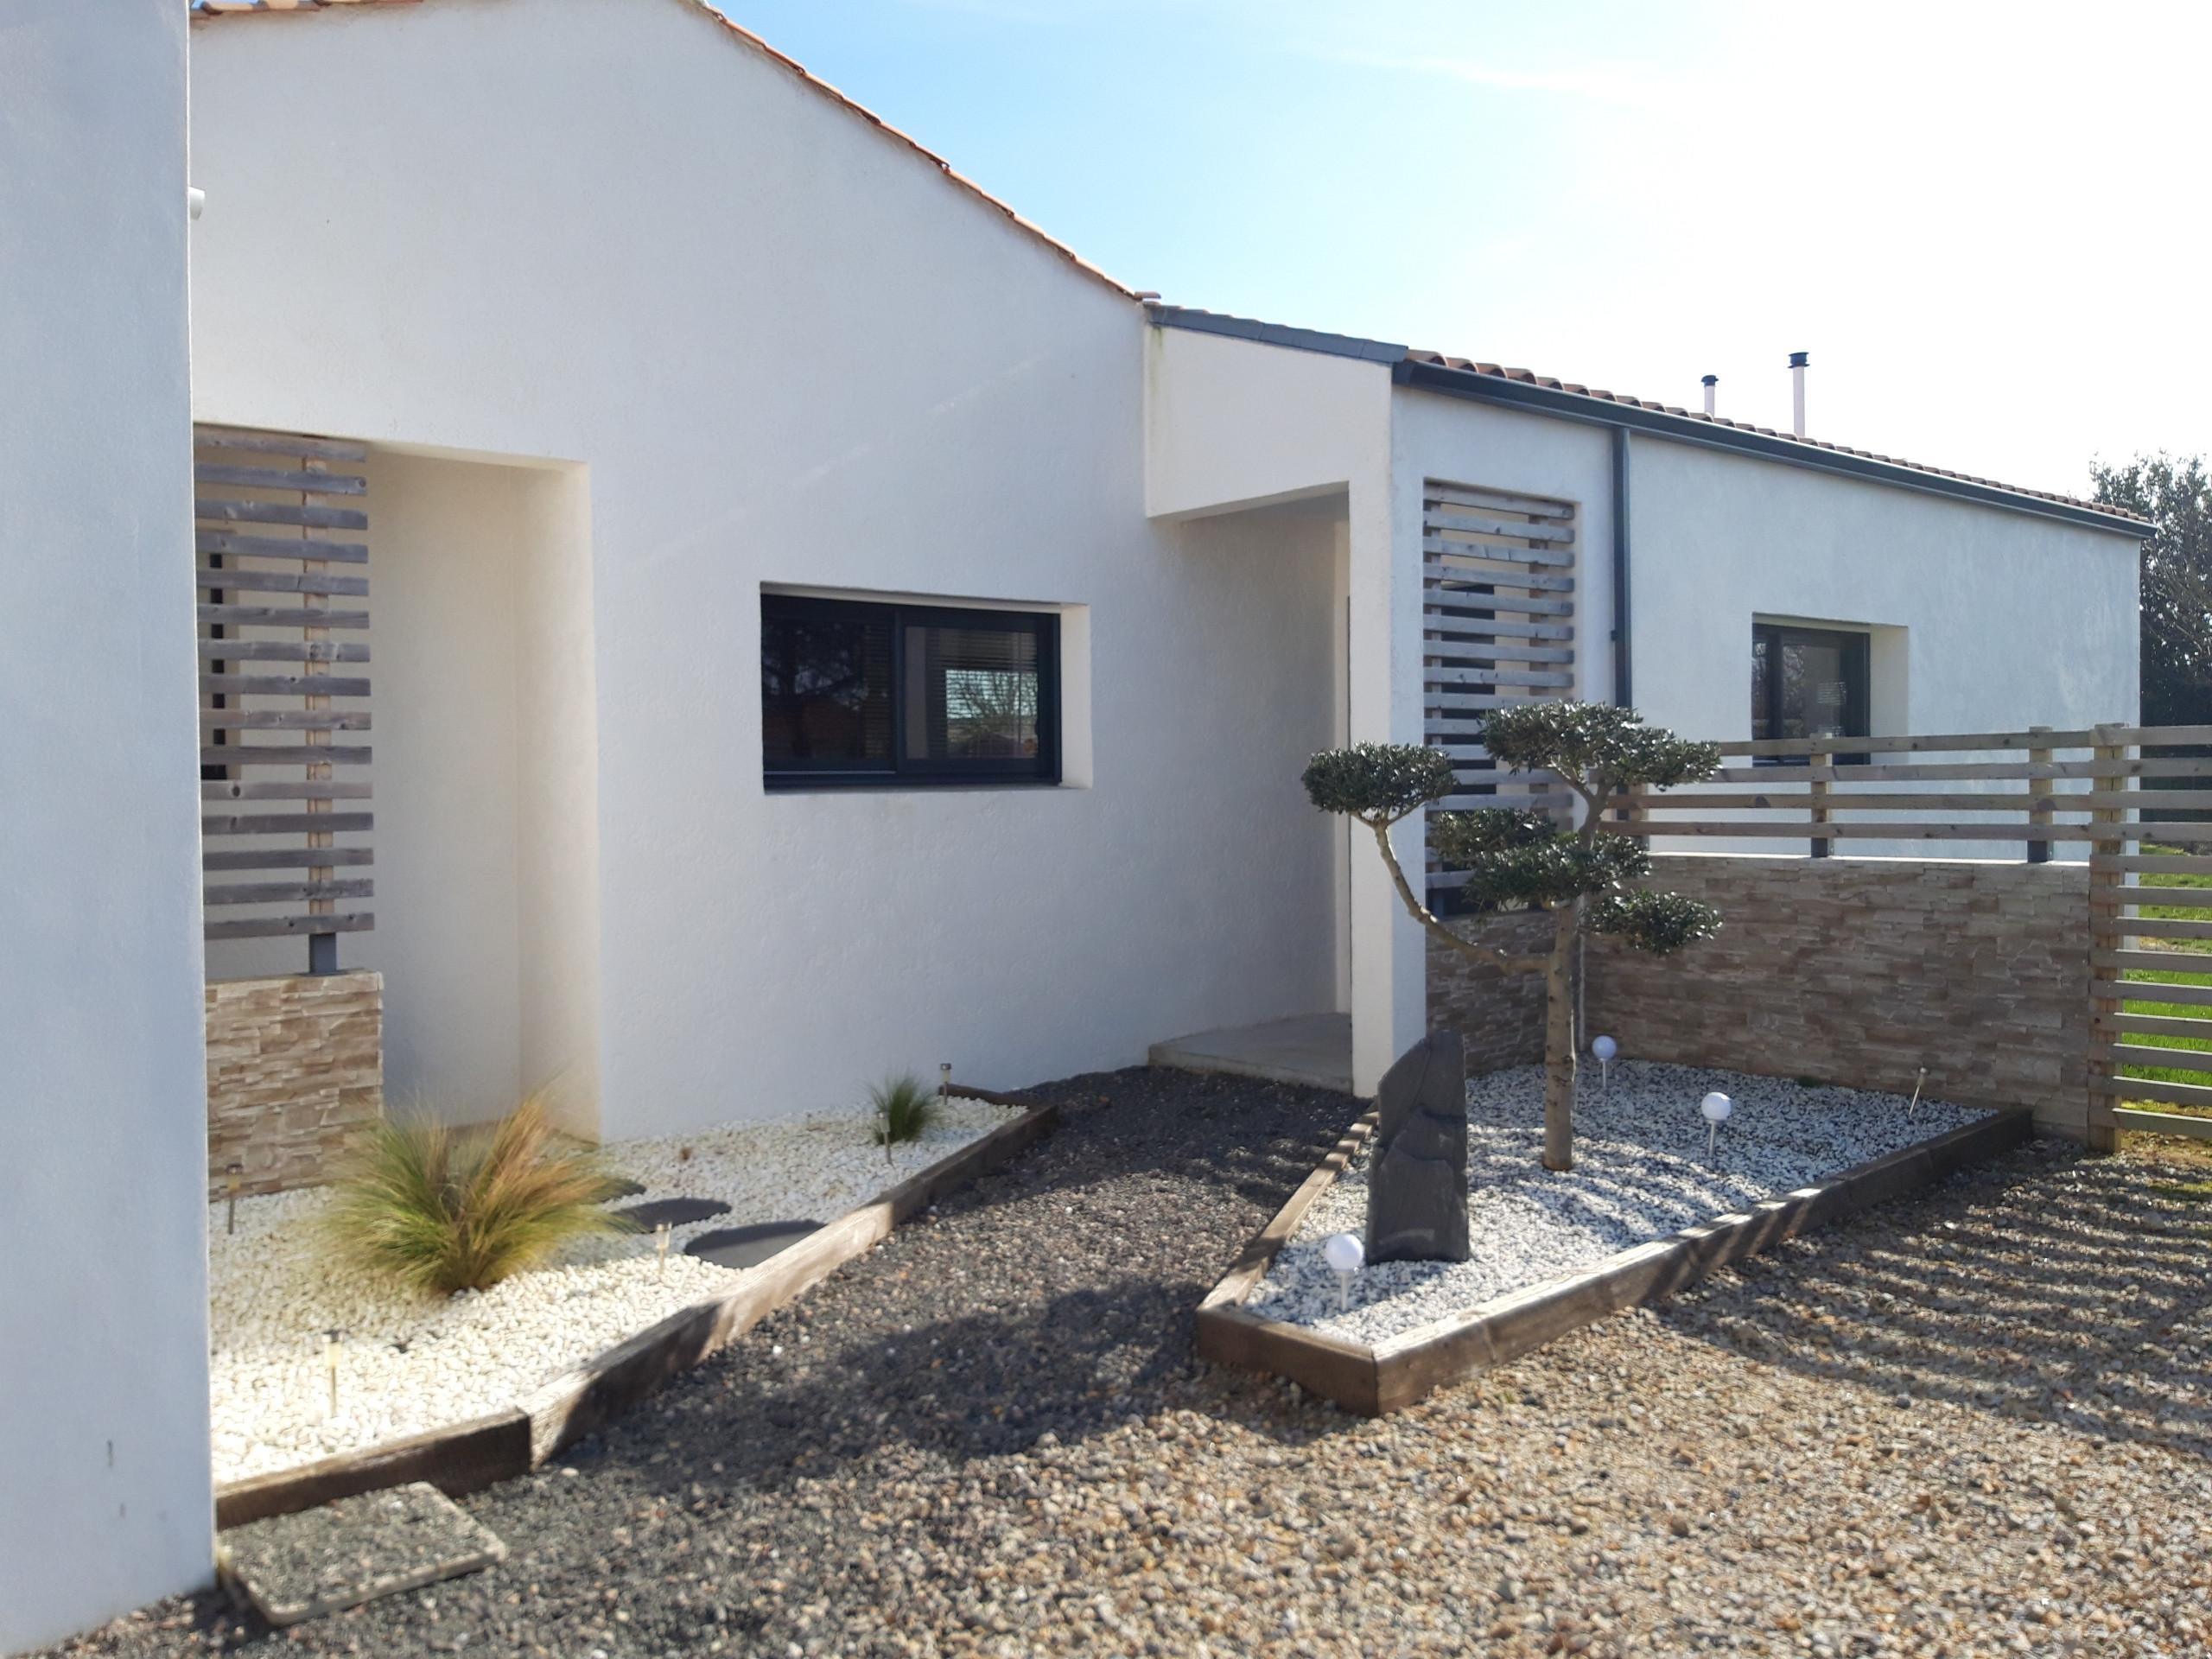 Projet Rénovation Maison Complete